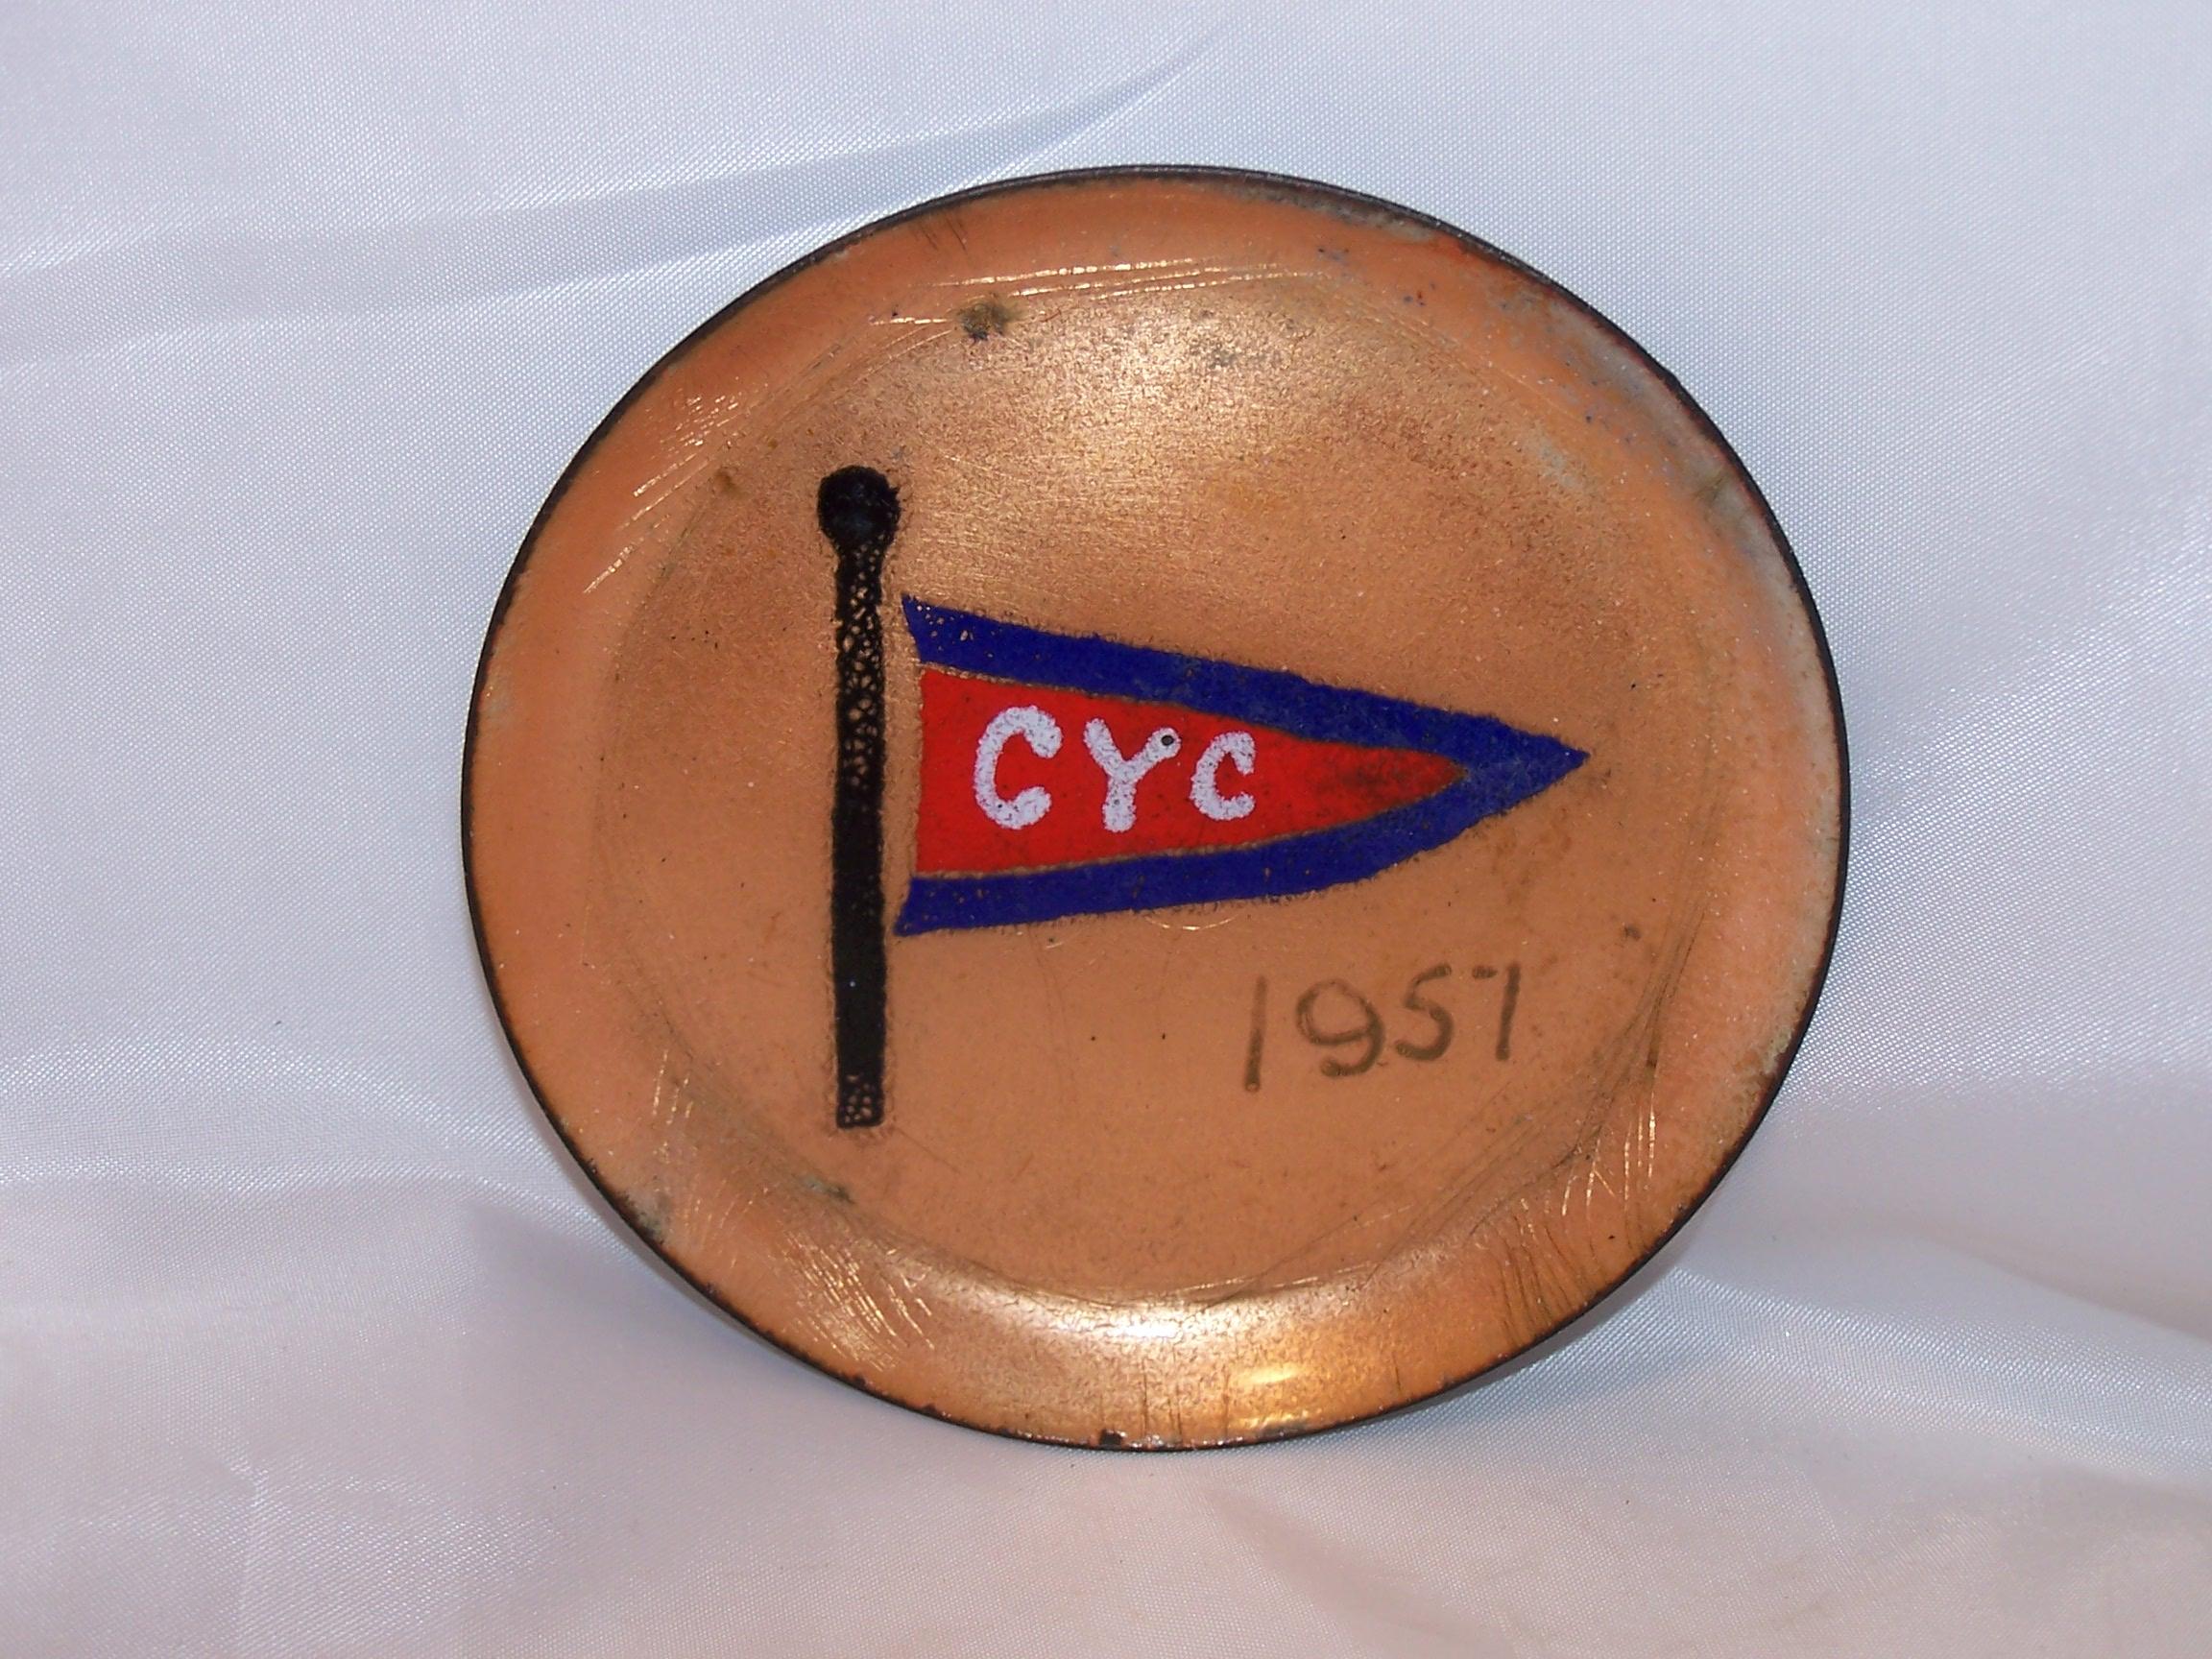 Herb Friedson Signed Enamel Dish, 1957, Cleveland Yachting Club